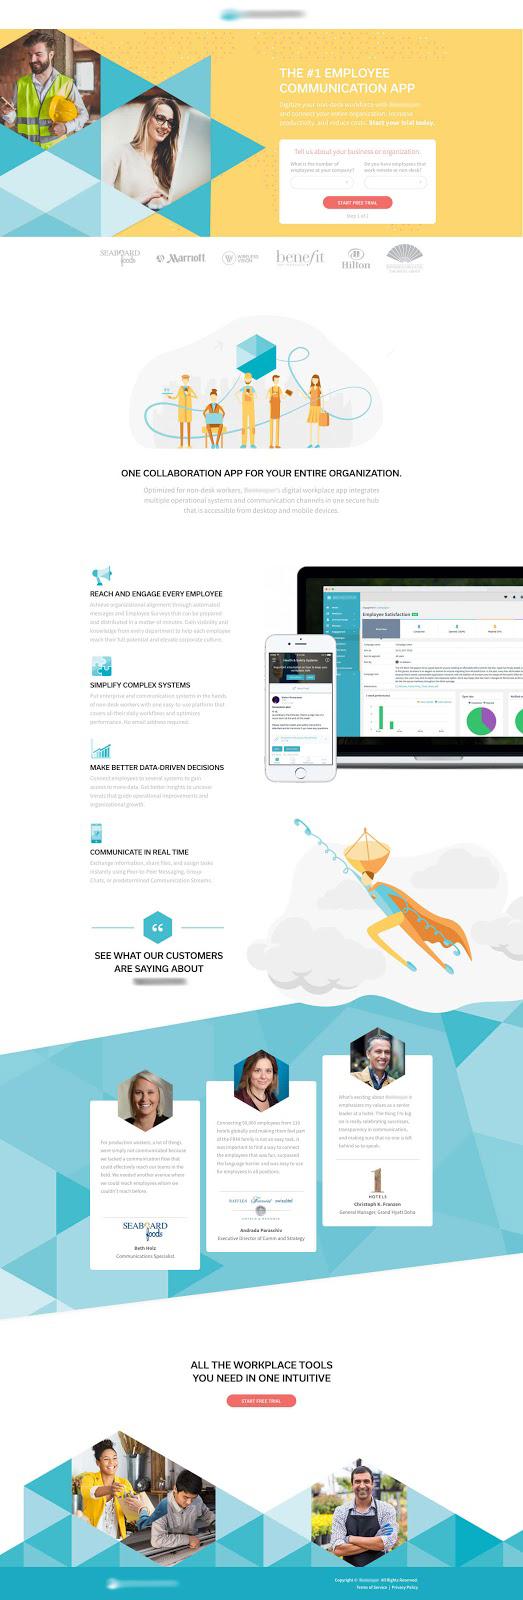 Employee communication app landing page designed by Michael Musa